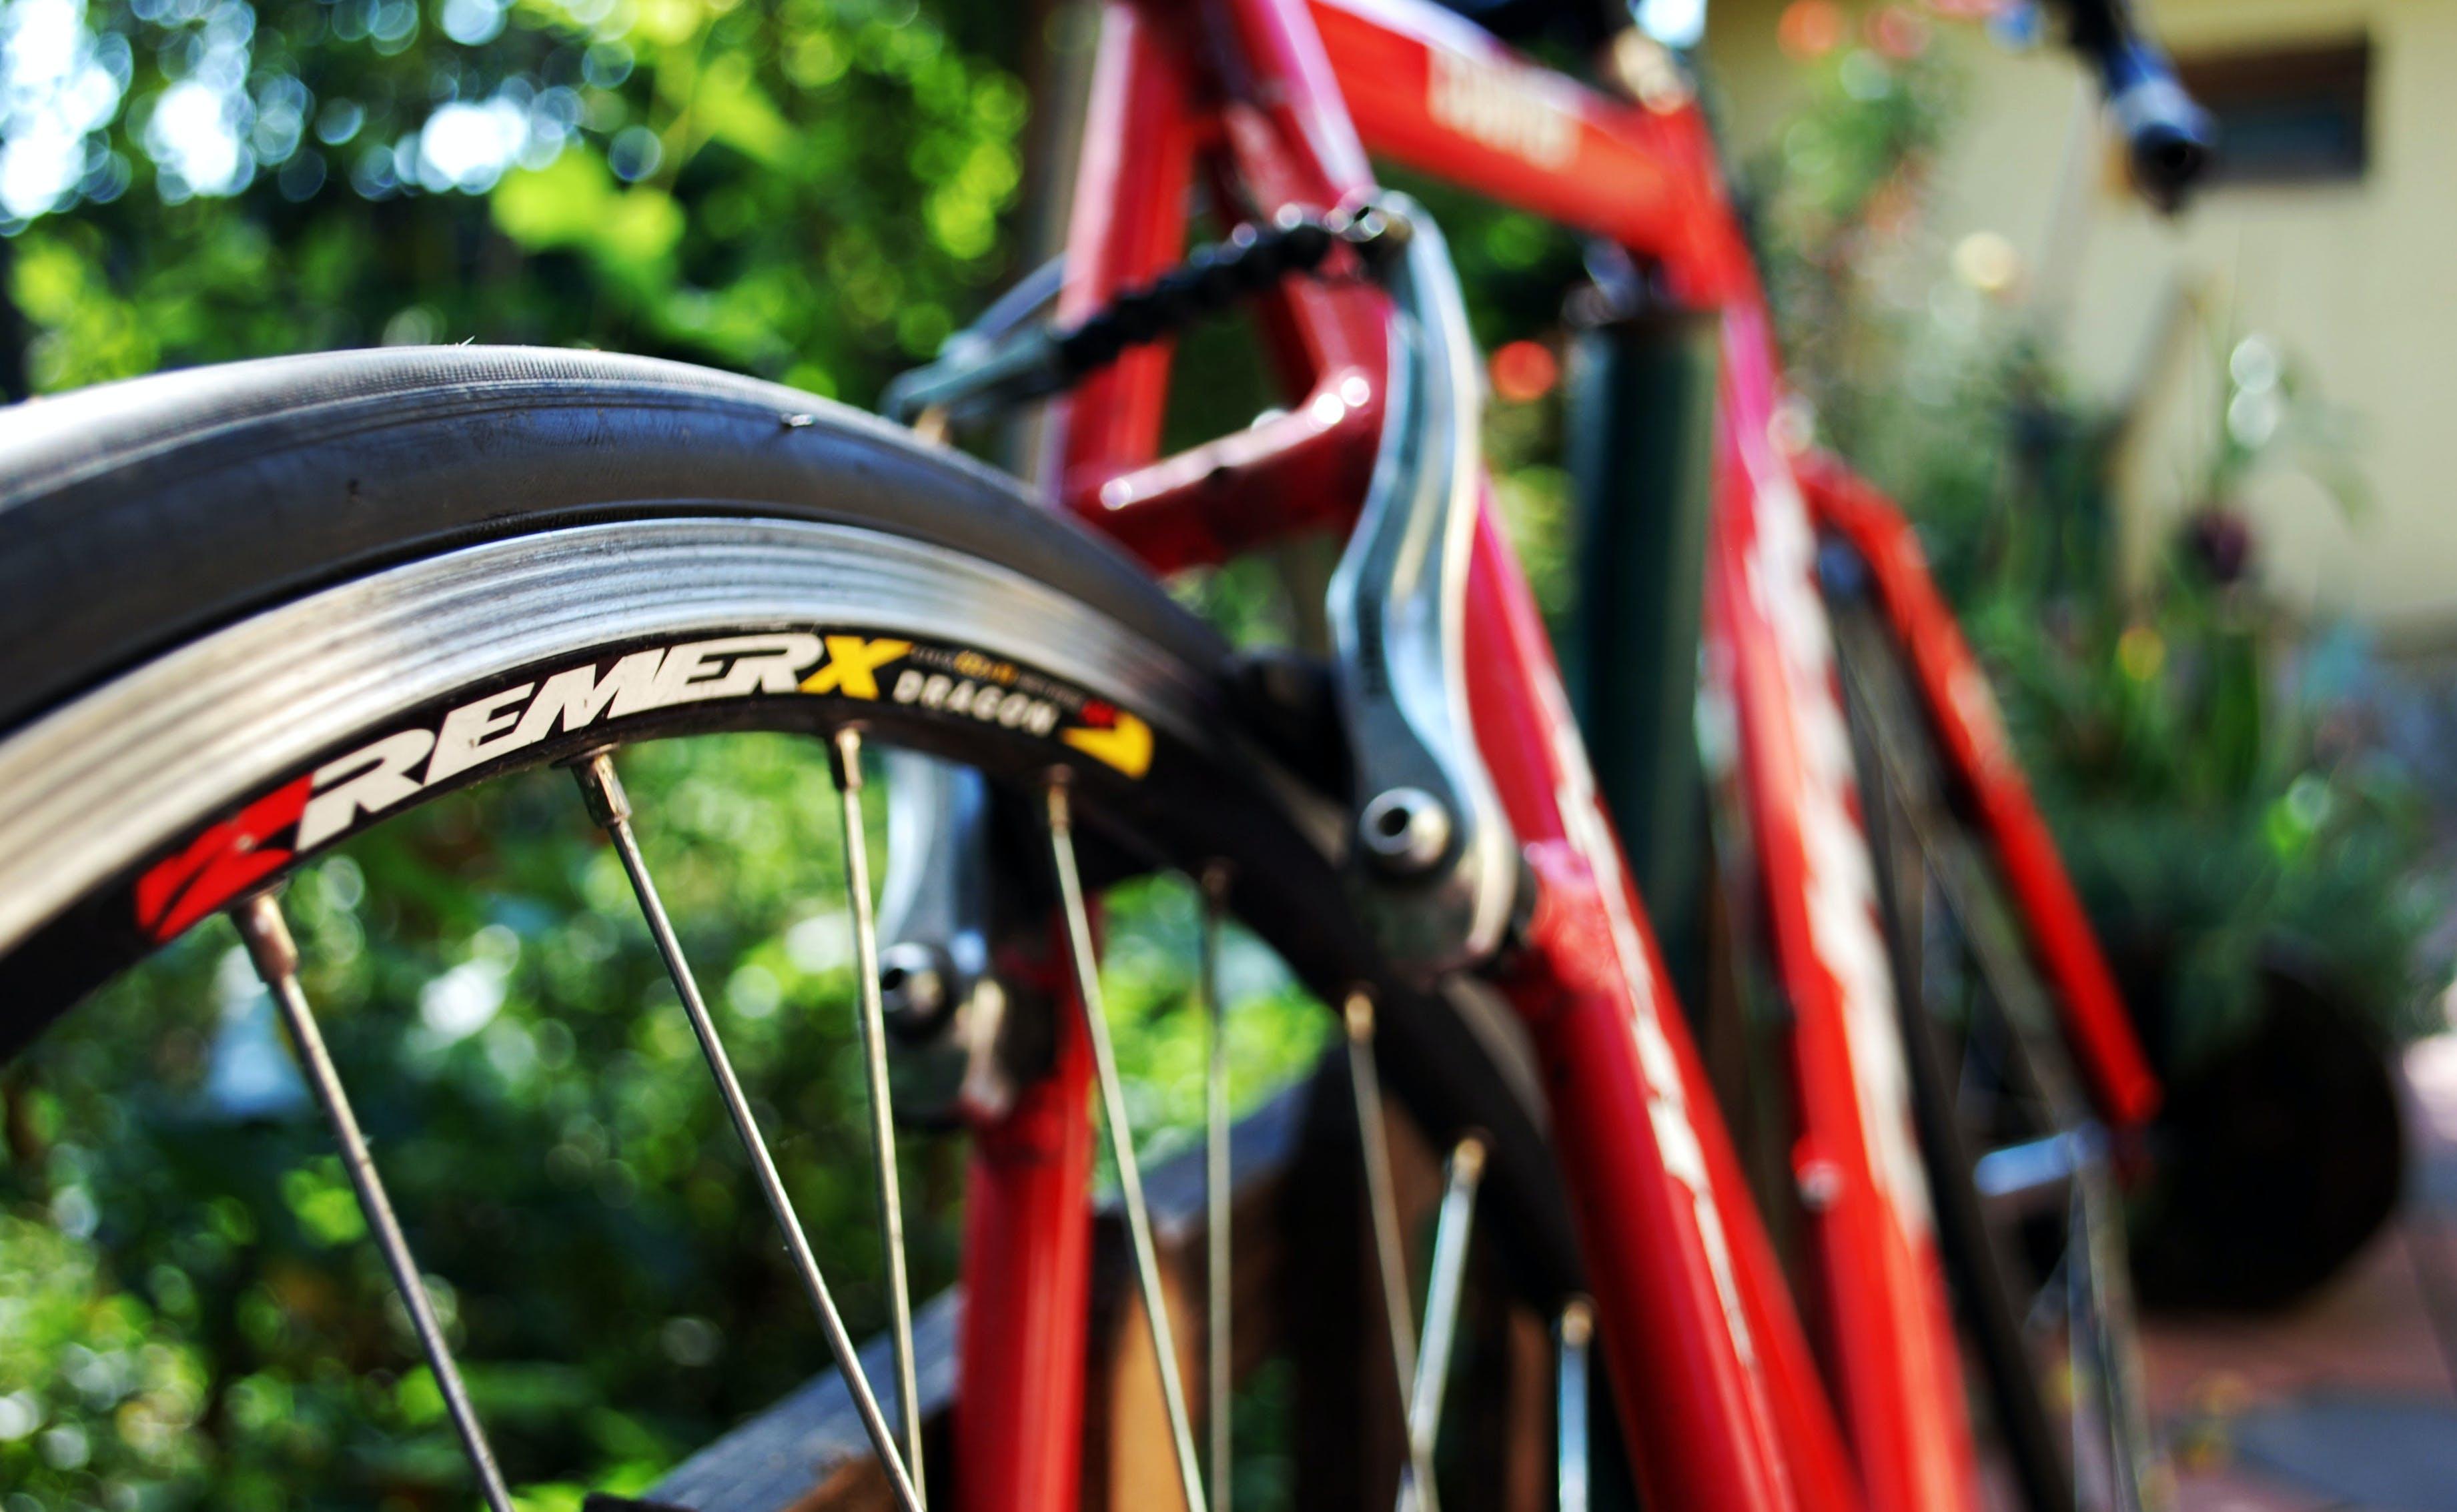 Red Black Remerx Bicycle